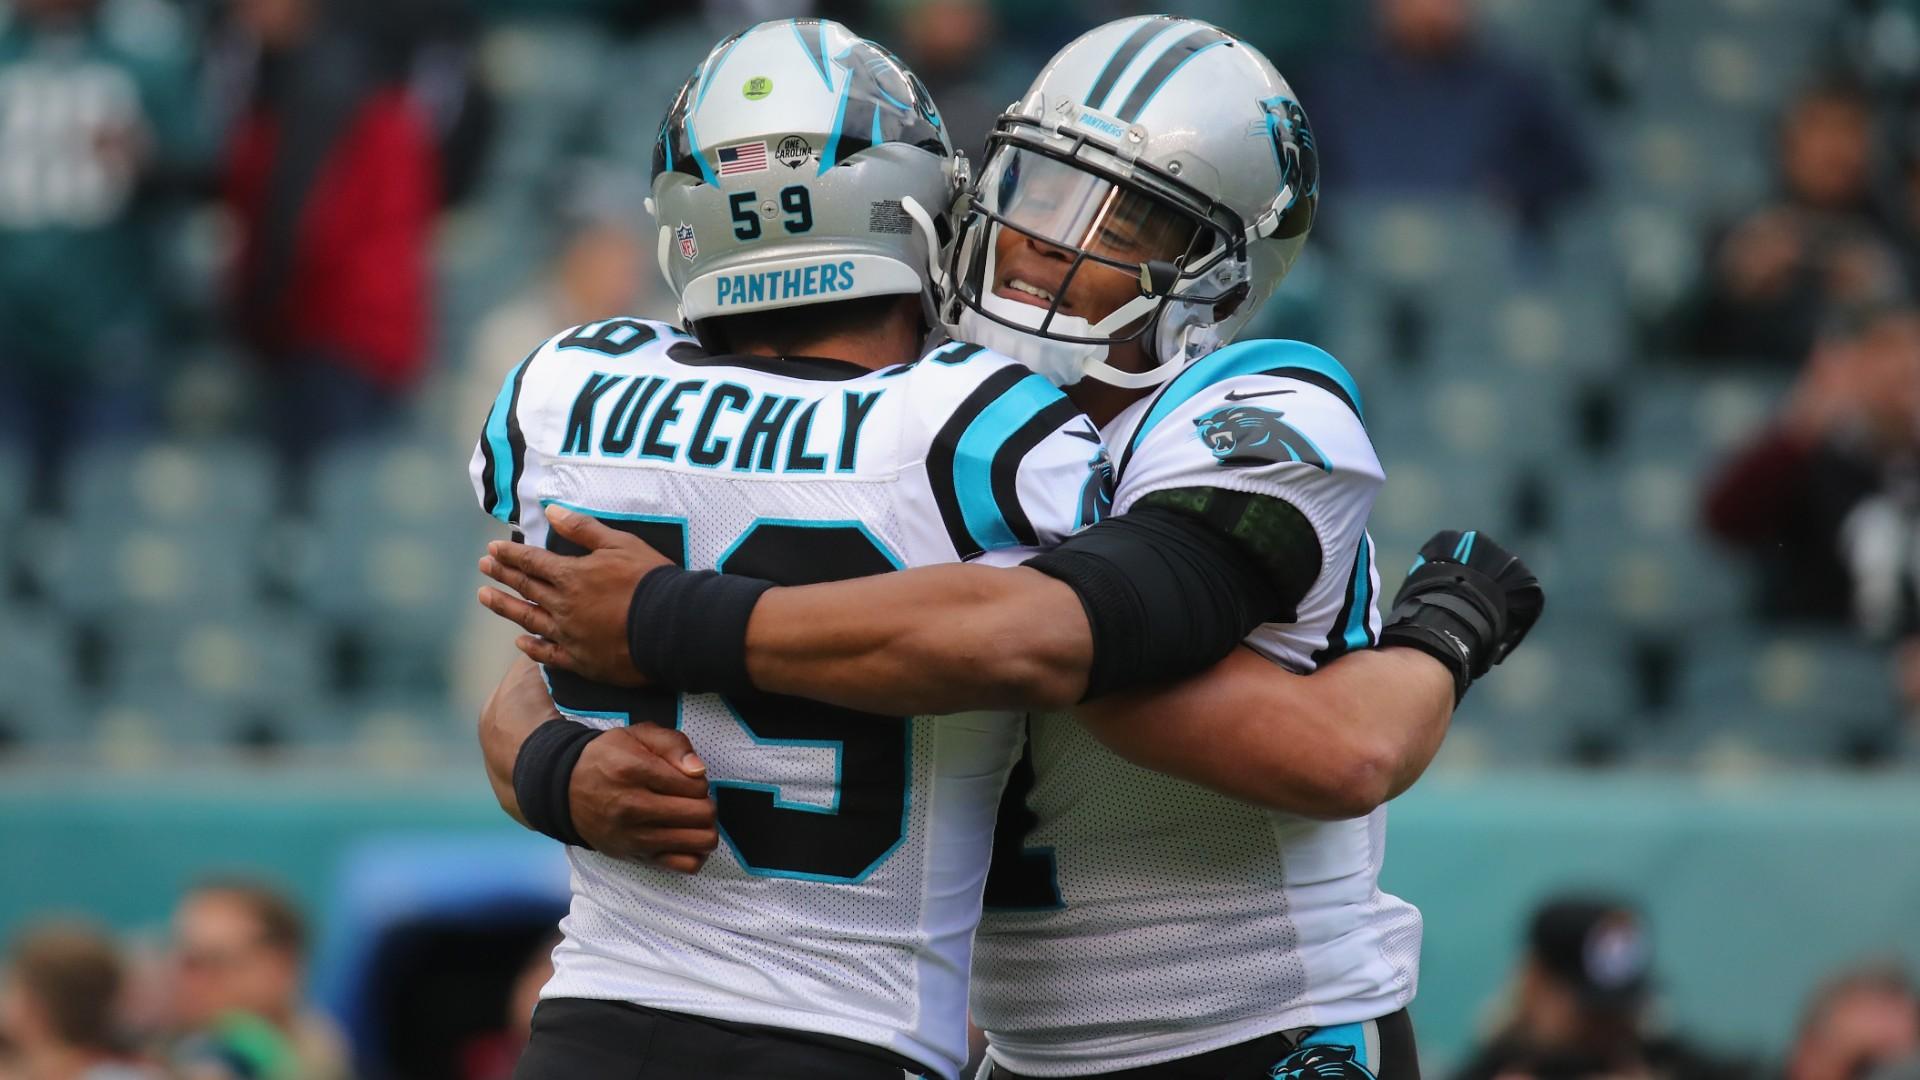 Carolina Panthers 2019 season schedule, scores and TV